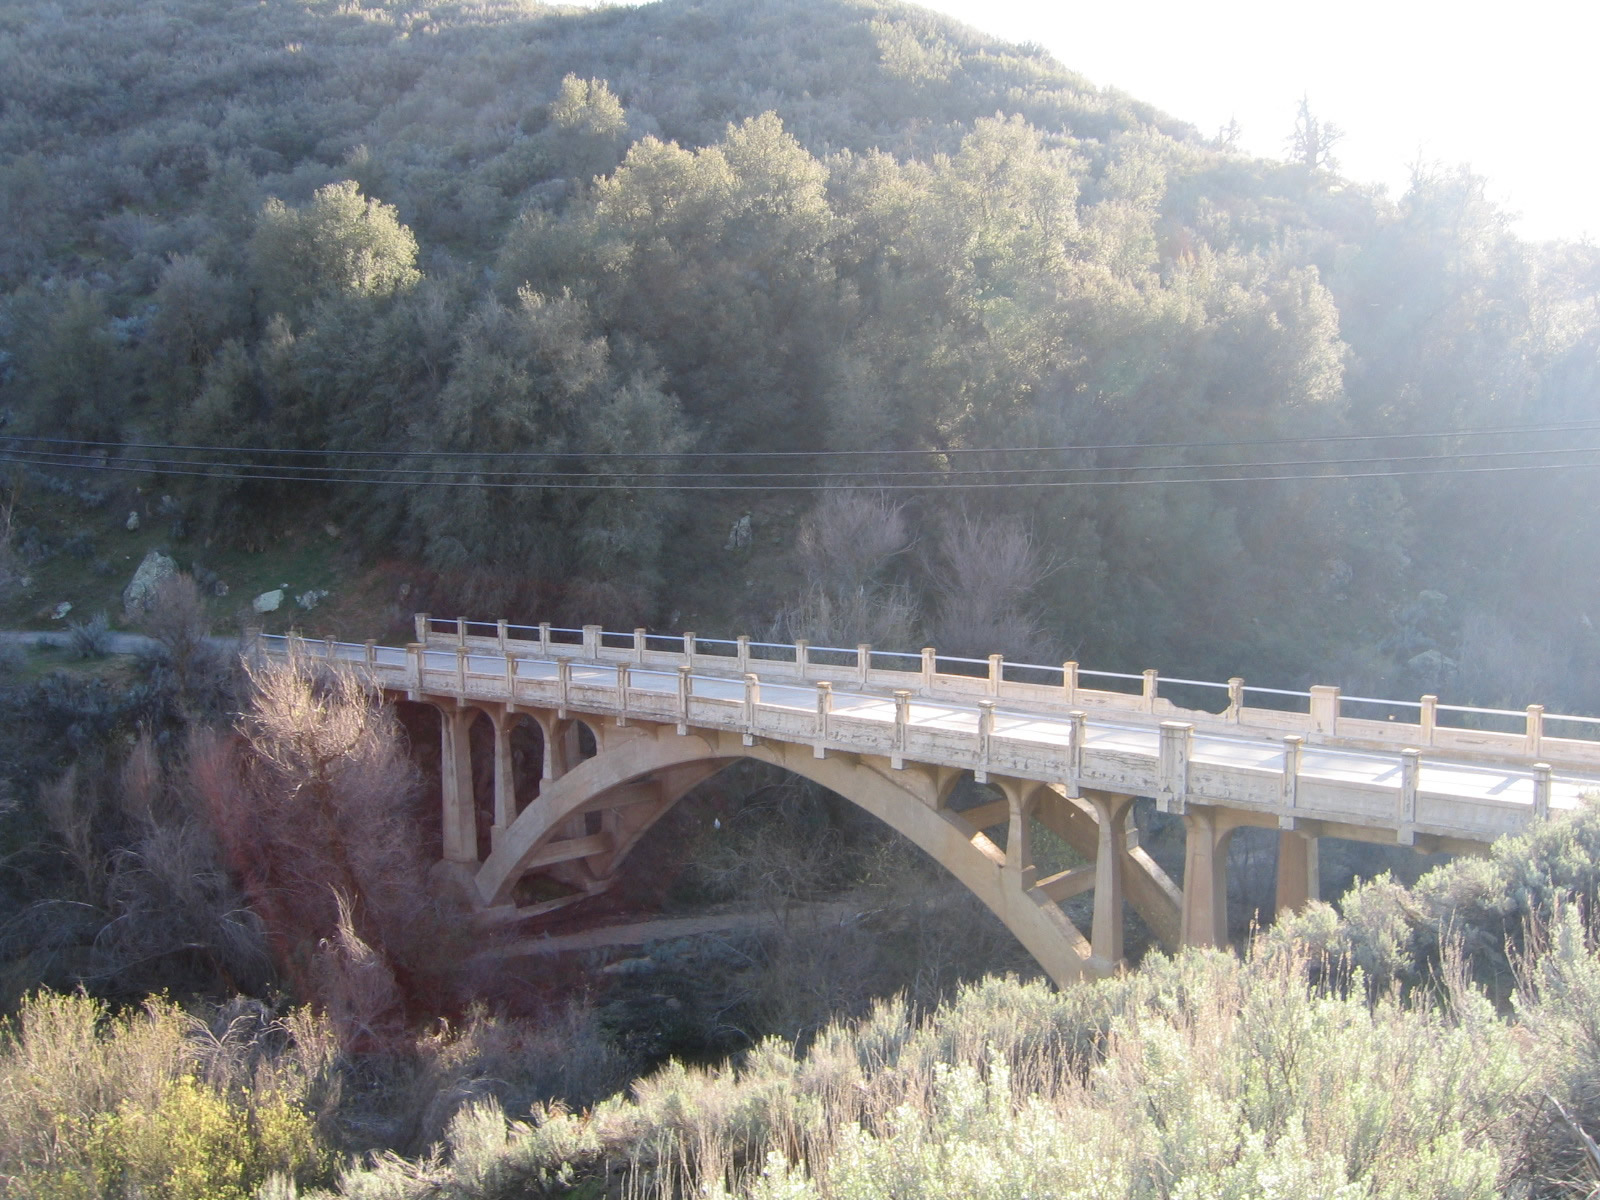 California @ AARoads - Historic U.S. 80